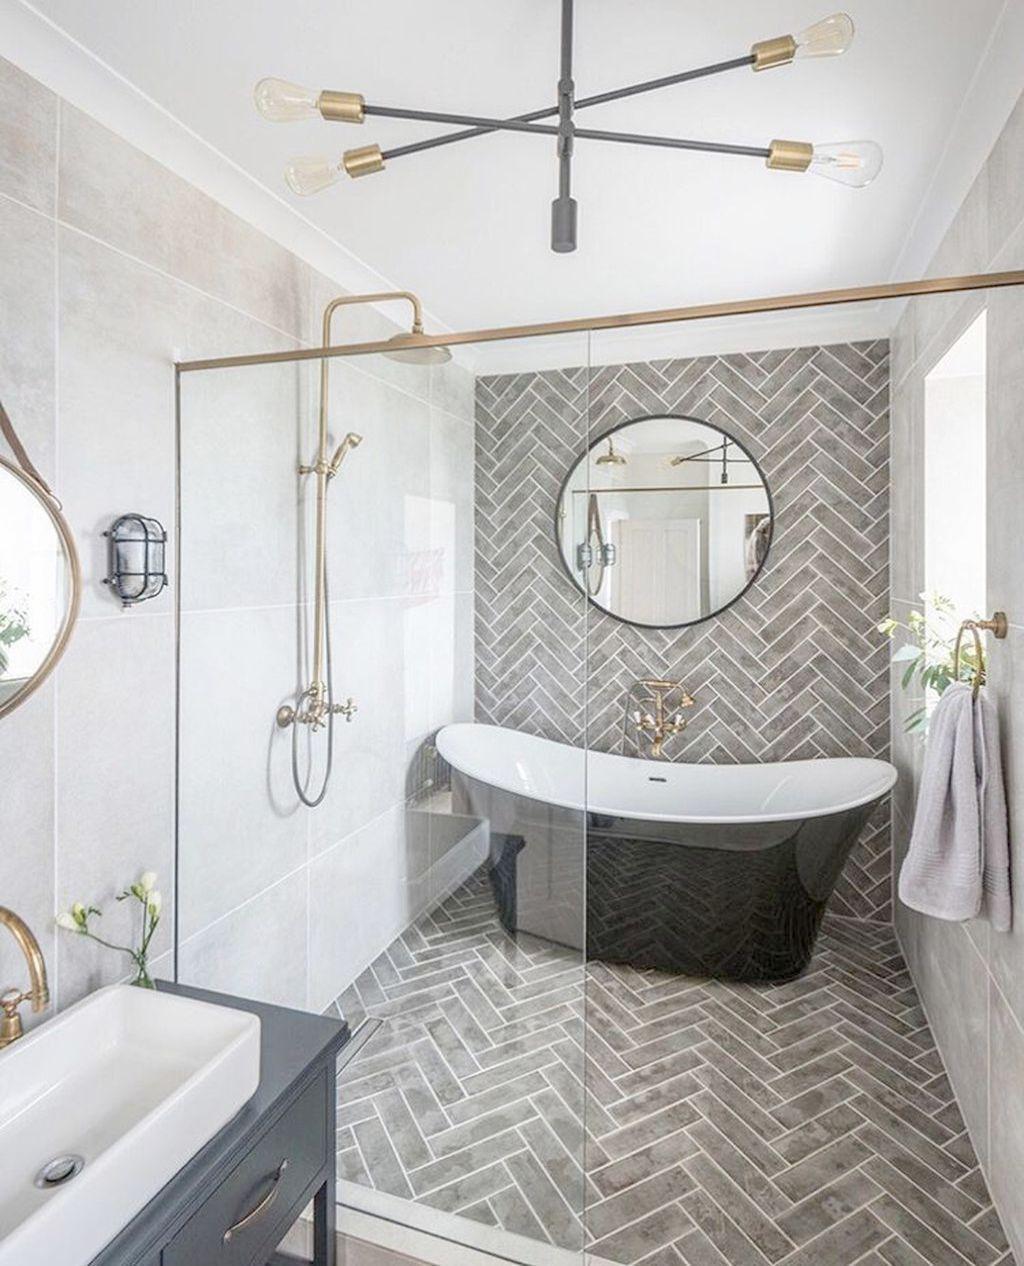 Bathroom Ideas Half Bath Best Bathroom Tile Ideas 2019 Bathroom Ideas Earth To Bat In 2020 Master Bathroom Renovation Master Bathroom Design Bathroom Tile Designs